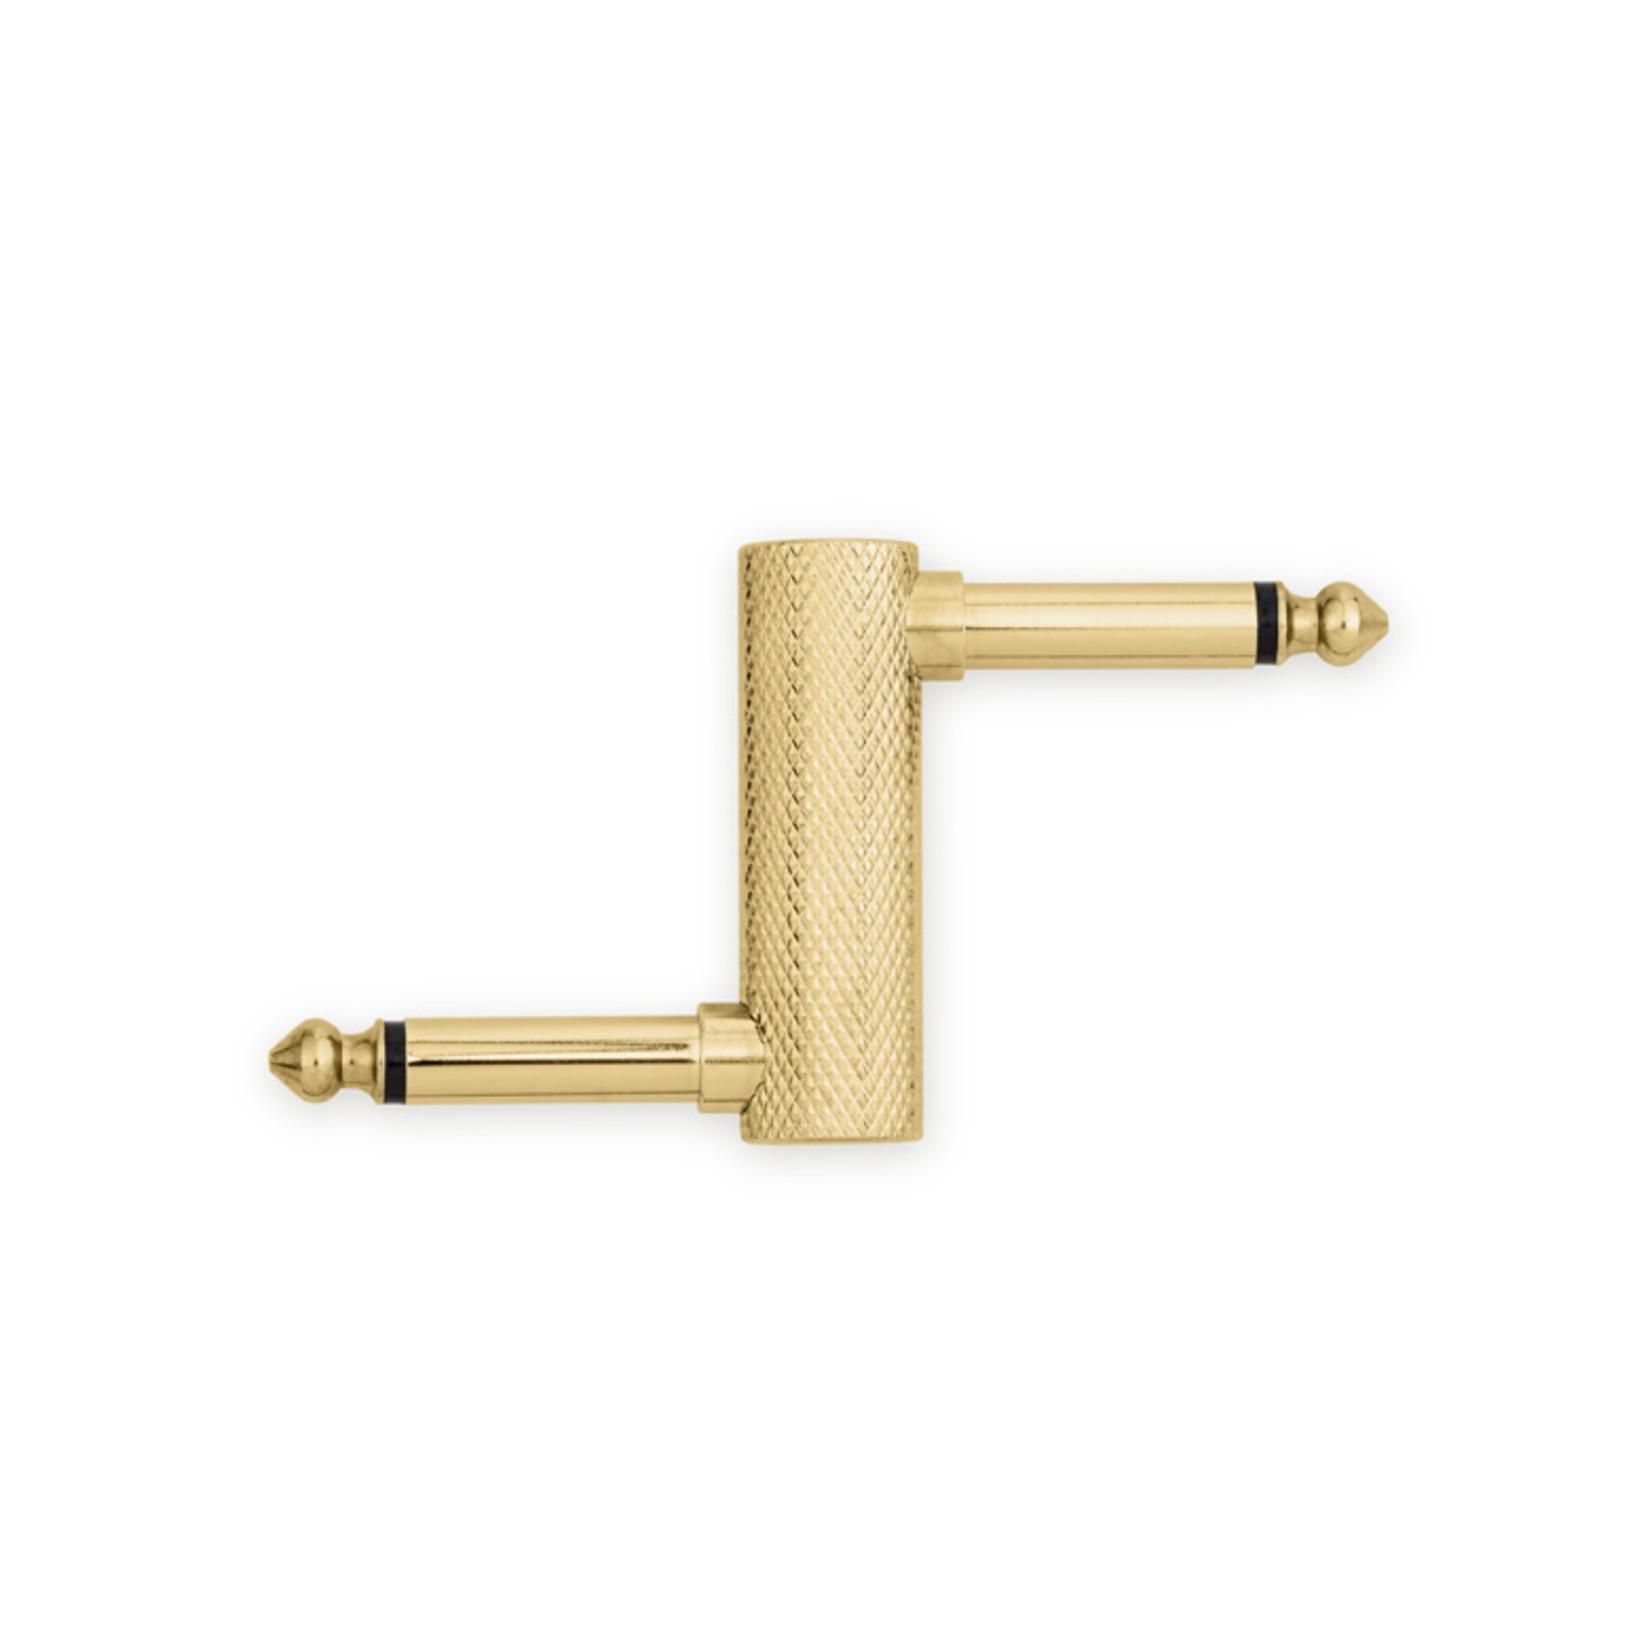 "Rockboard Rockboard N-Connector / Pedal Coupler, 1/4"" Gold"